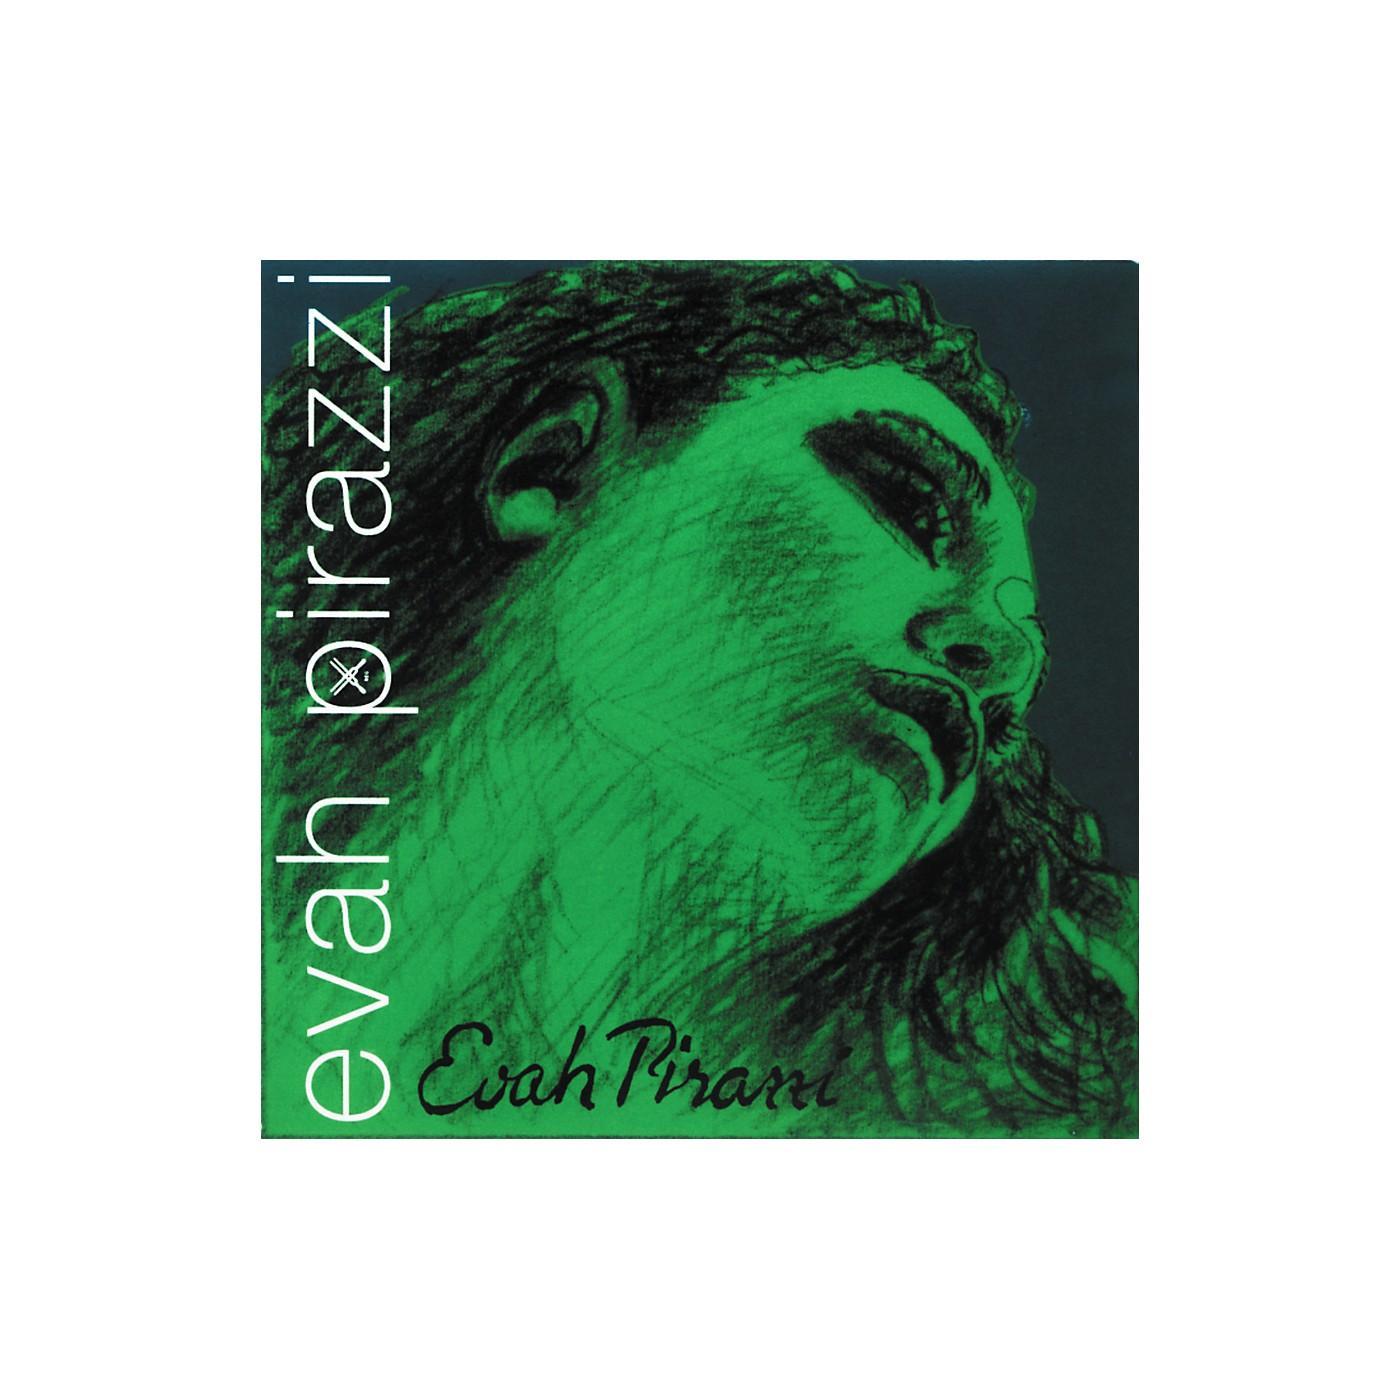 Pirastro Evah Pirazzi Series Violin String Set thumbnail